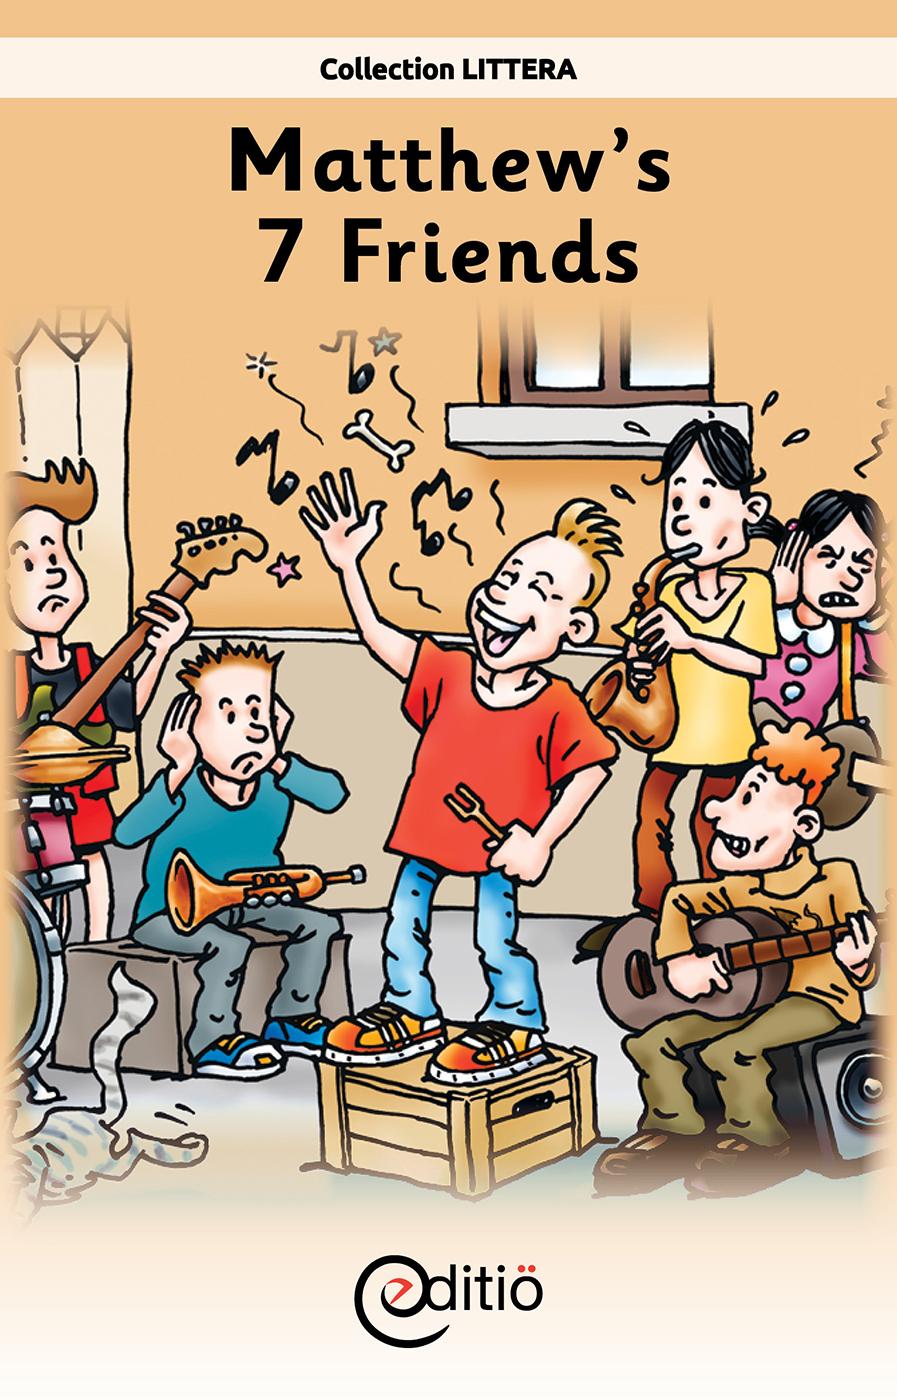 Matthew's 7 Friends